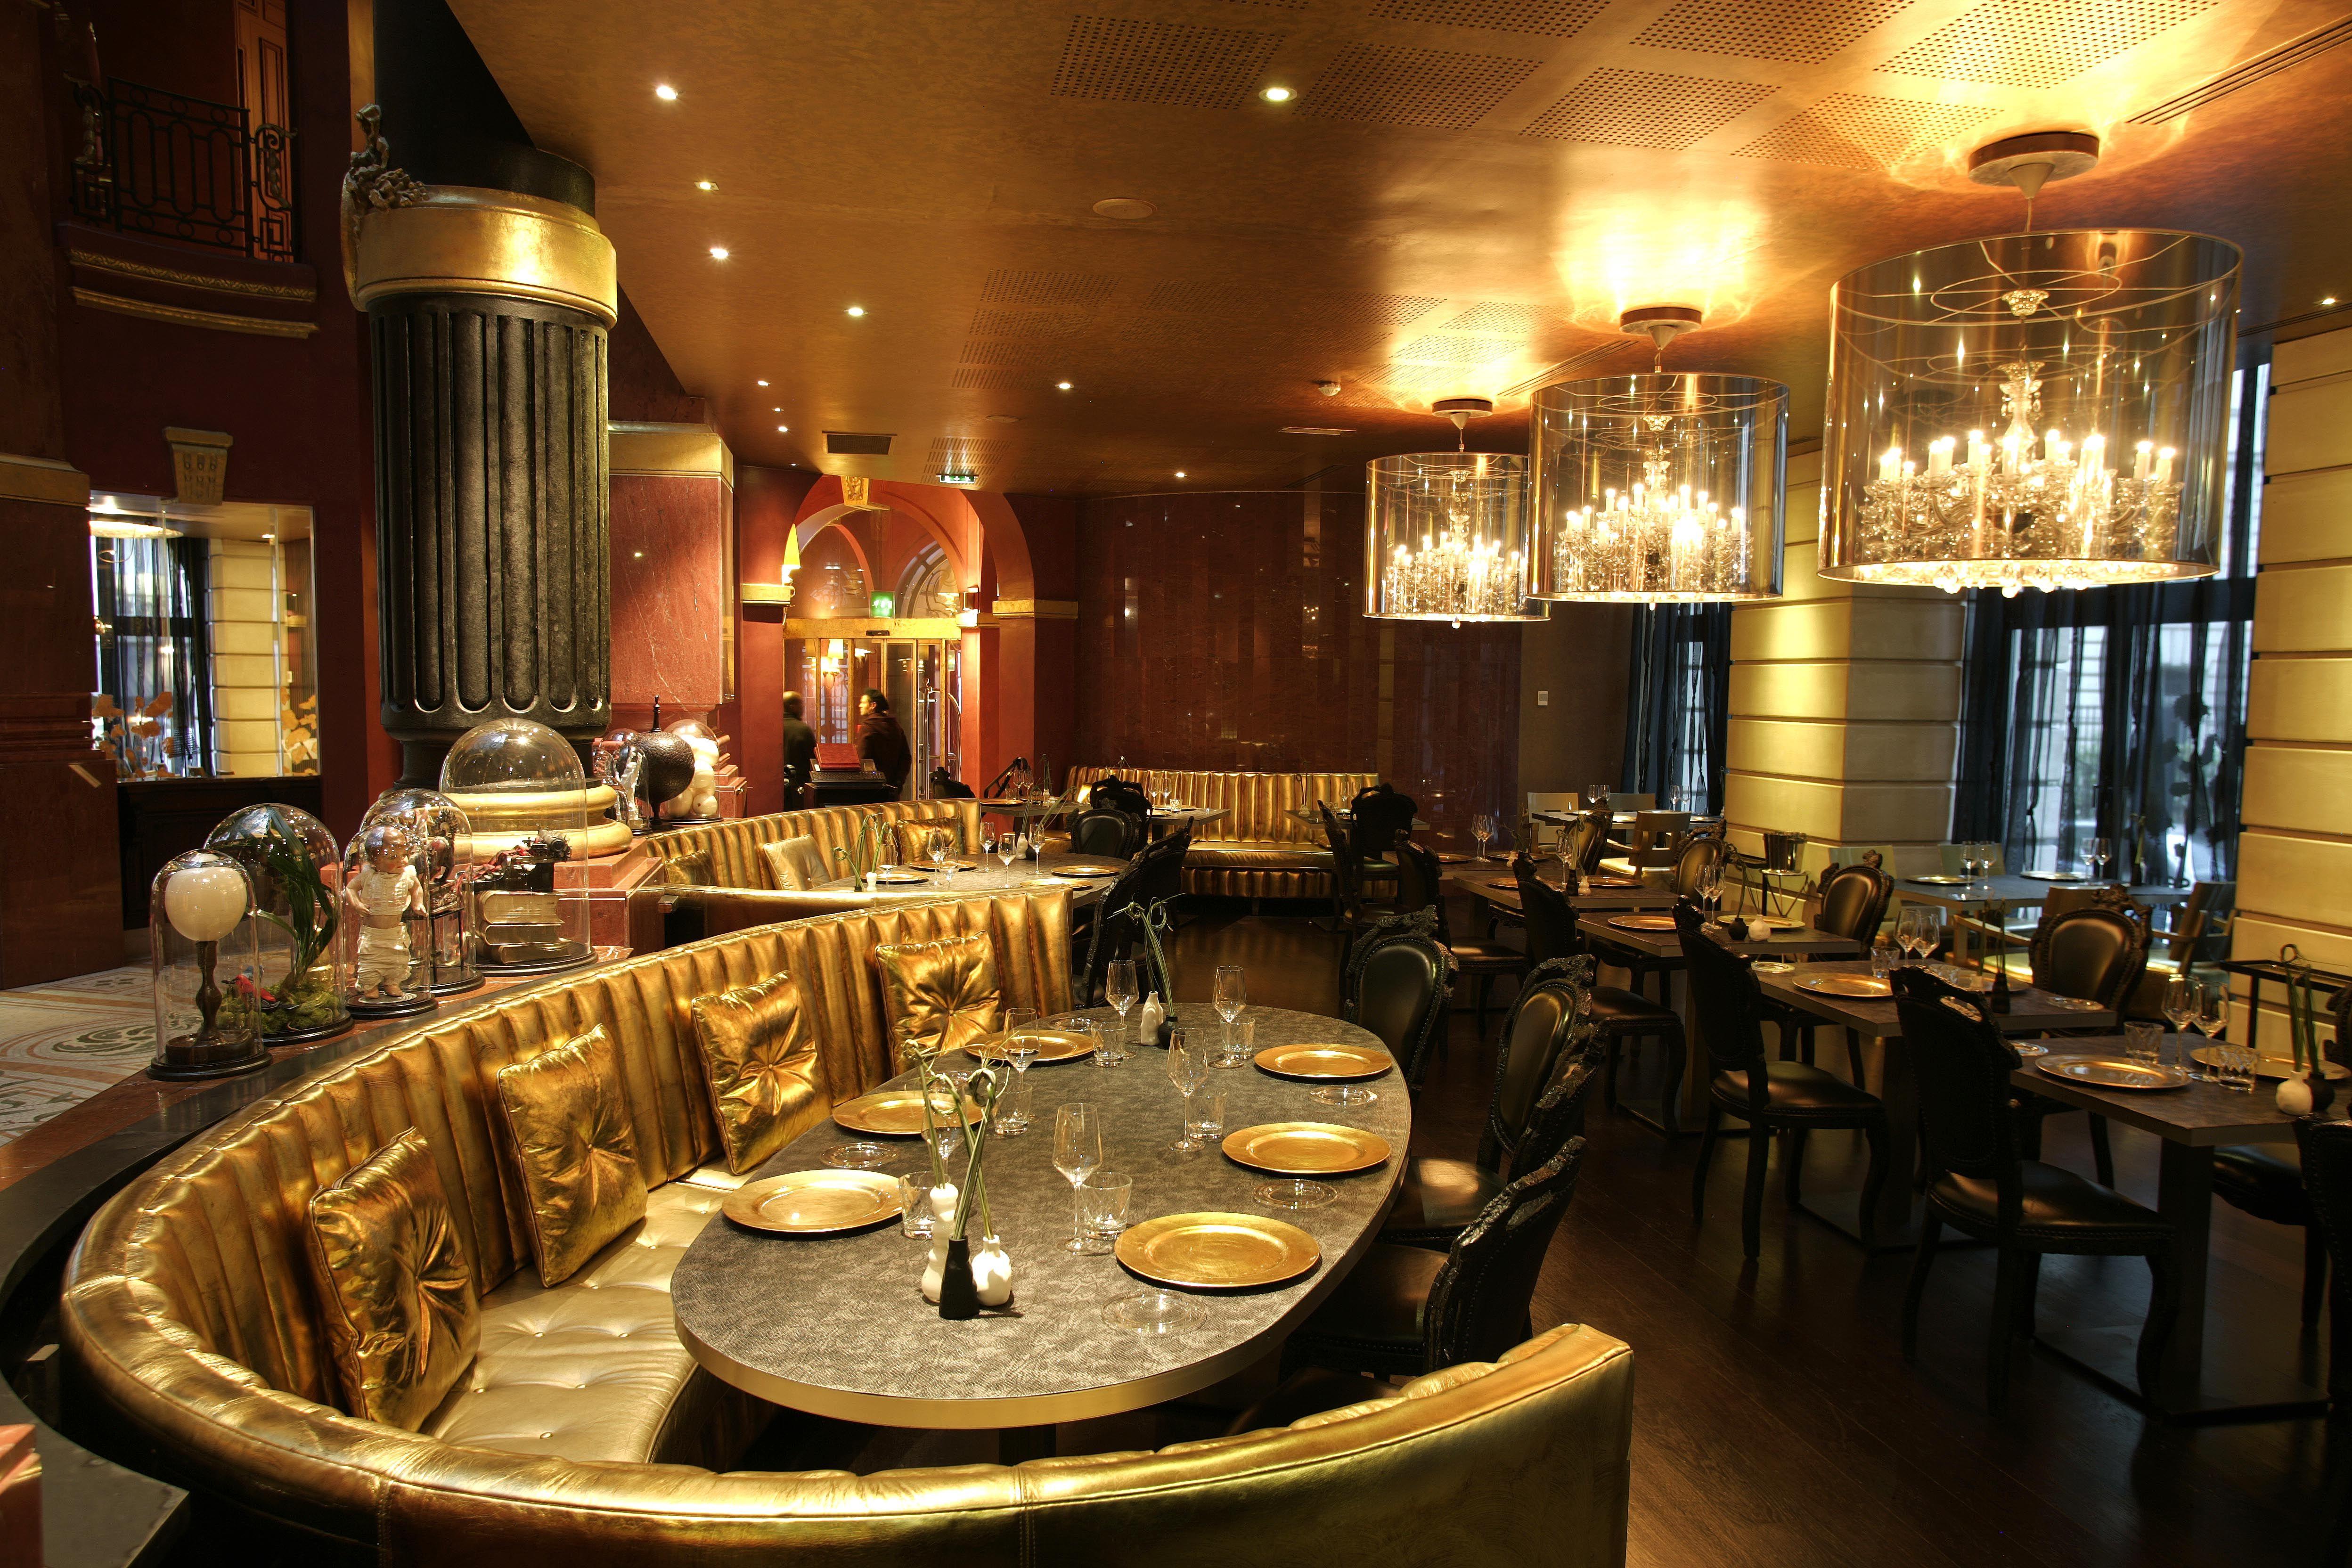 Five Star Restaurants Paris Hotel Banke Gives You A Creative Restaurant Josefin And Tail Bar The Tourist